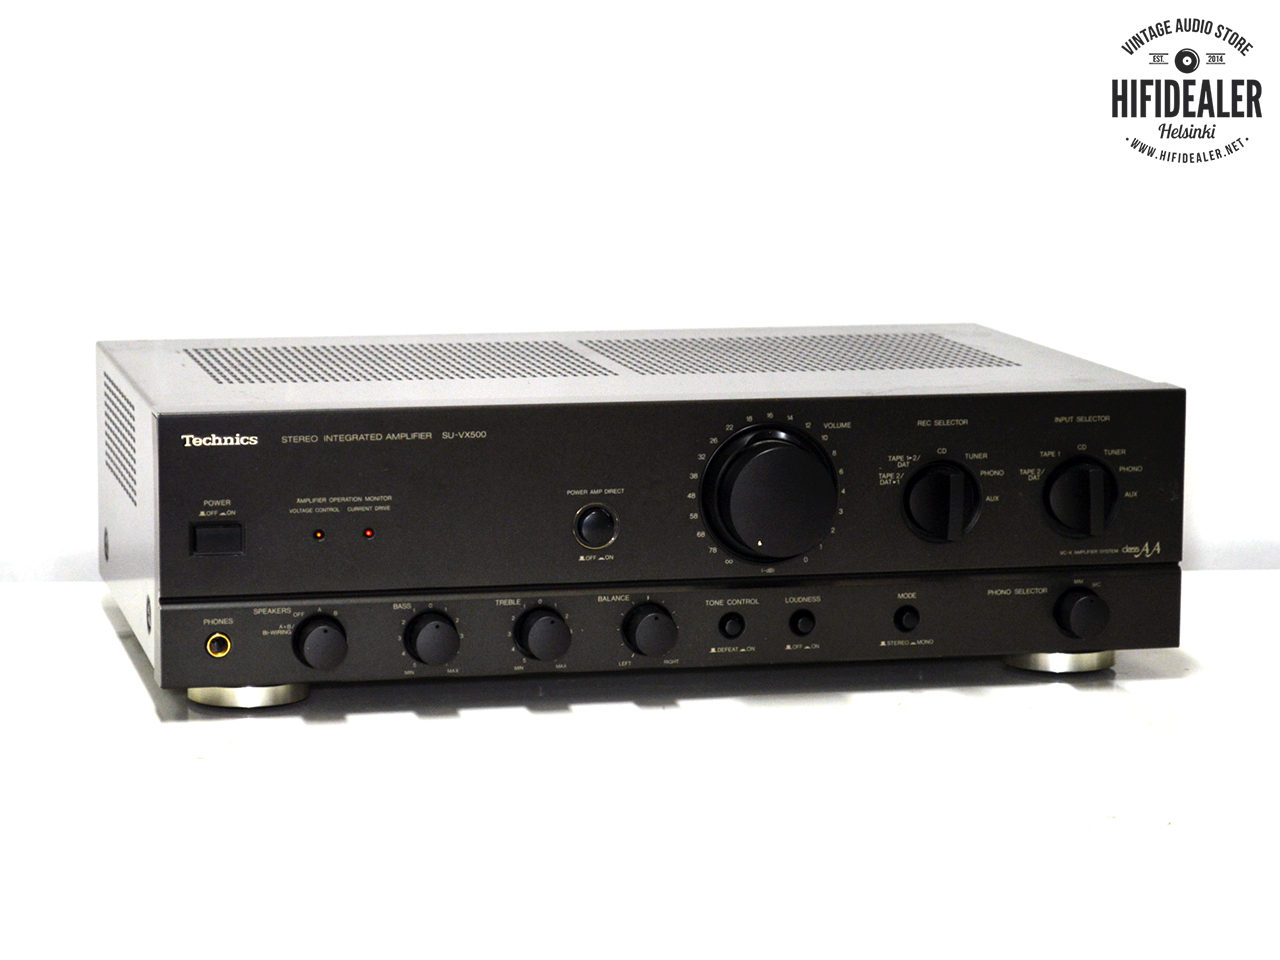 technics-su-vx500